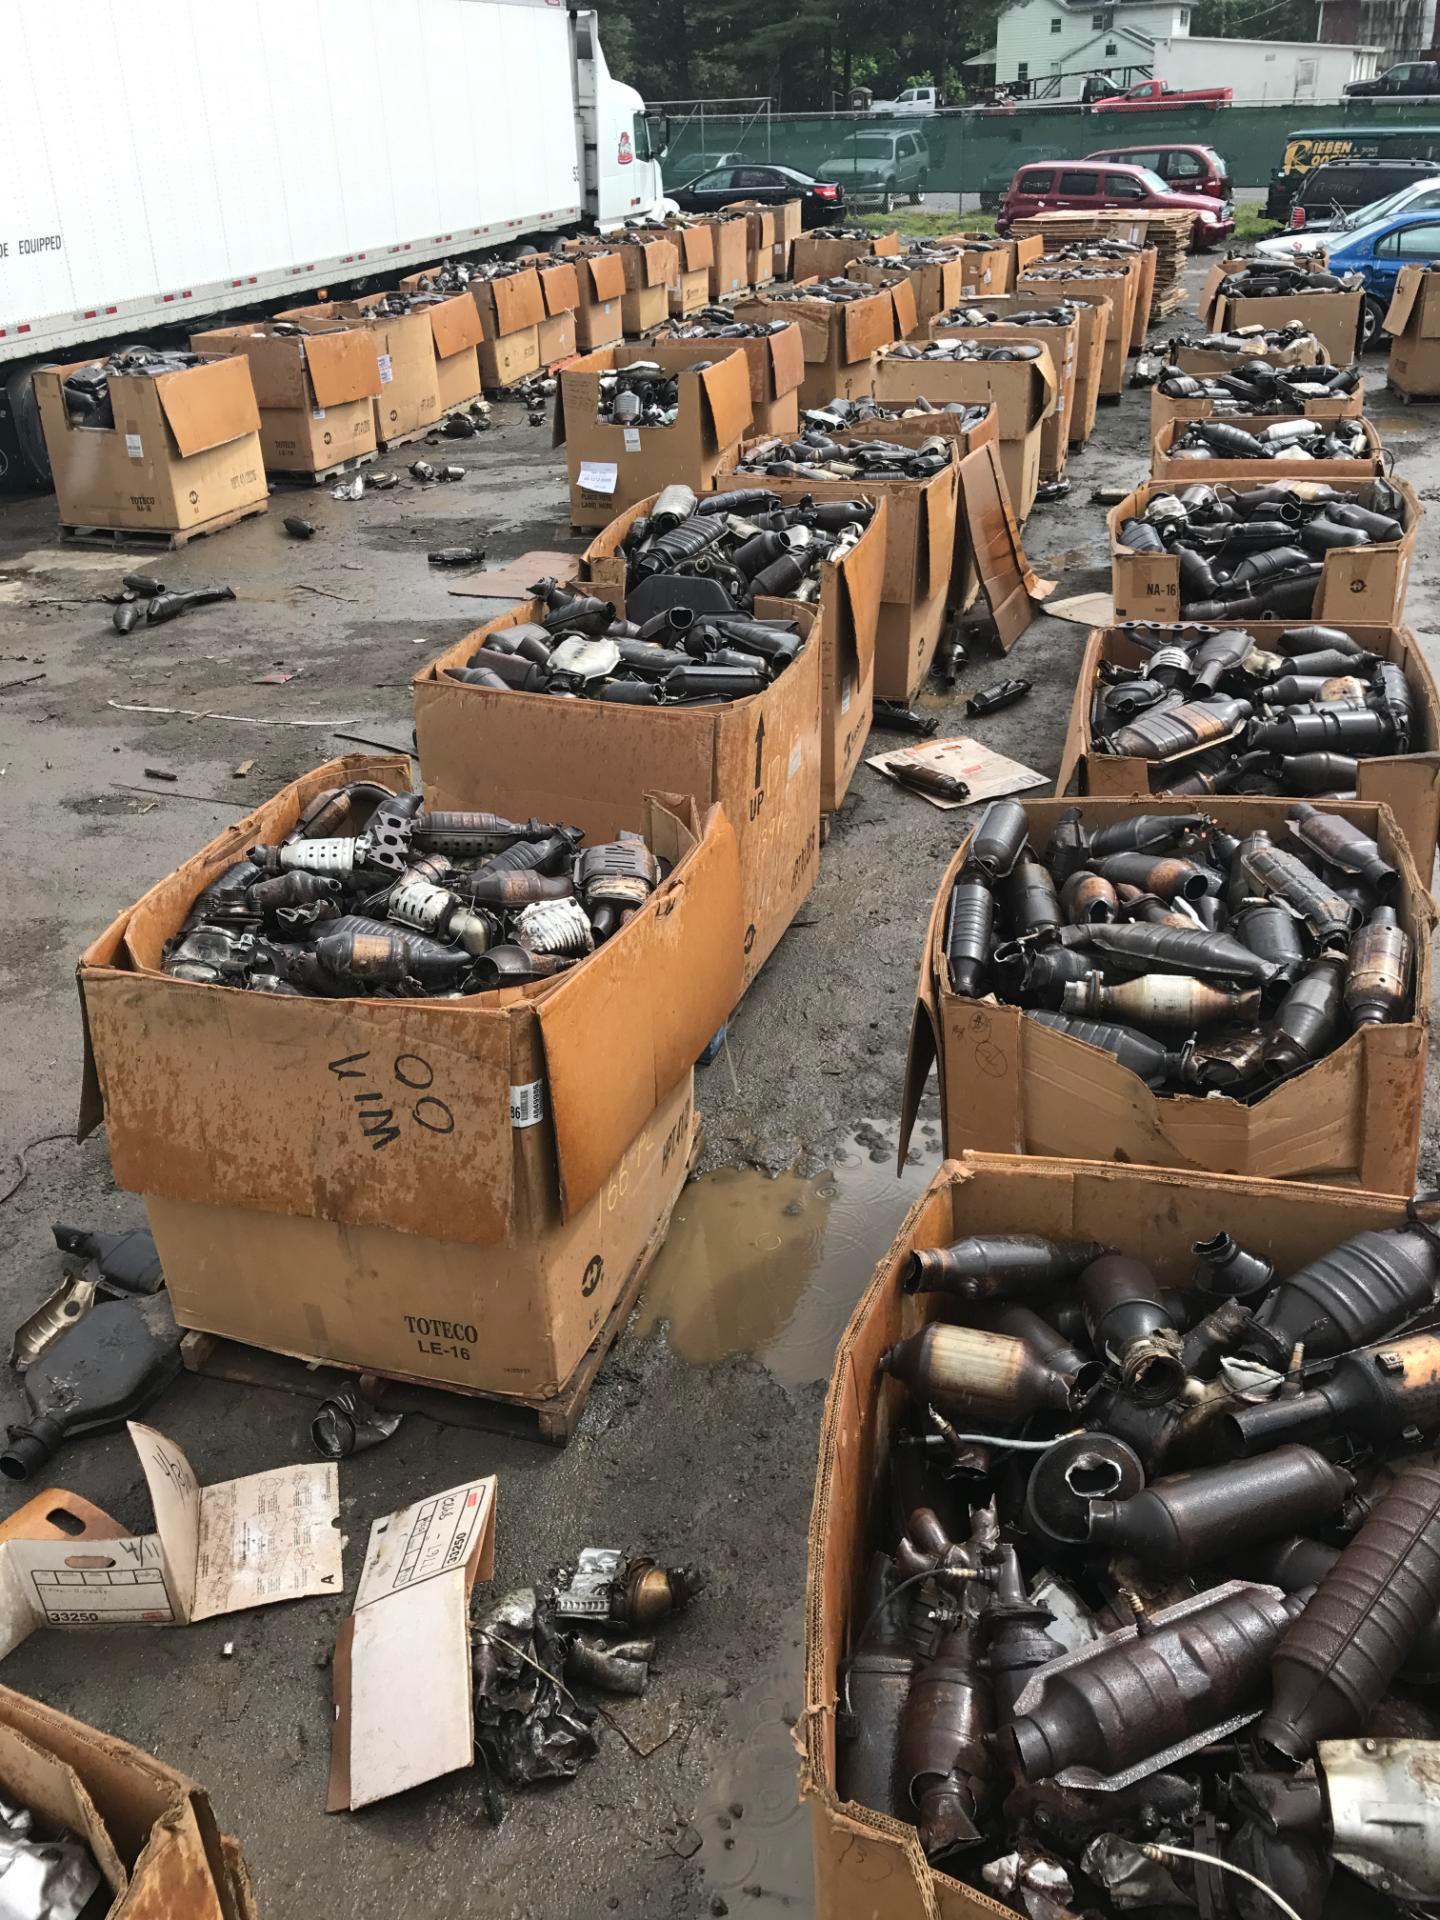 YS Catalytic Recycling LLC